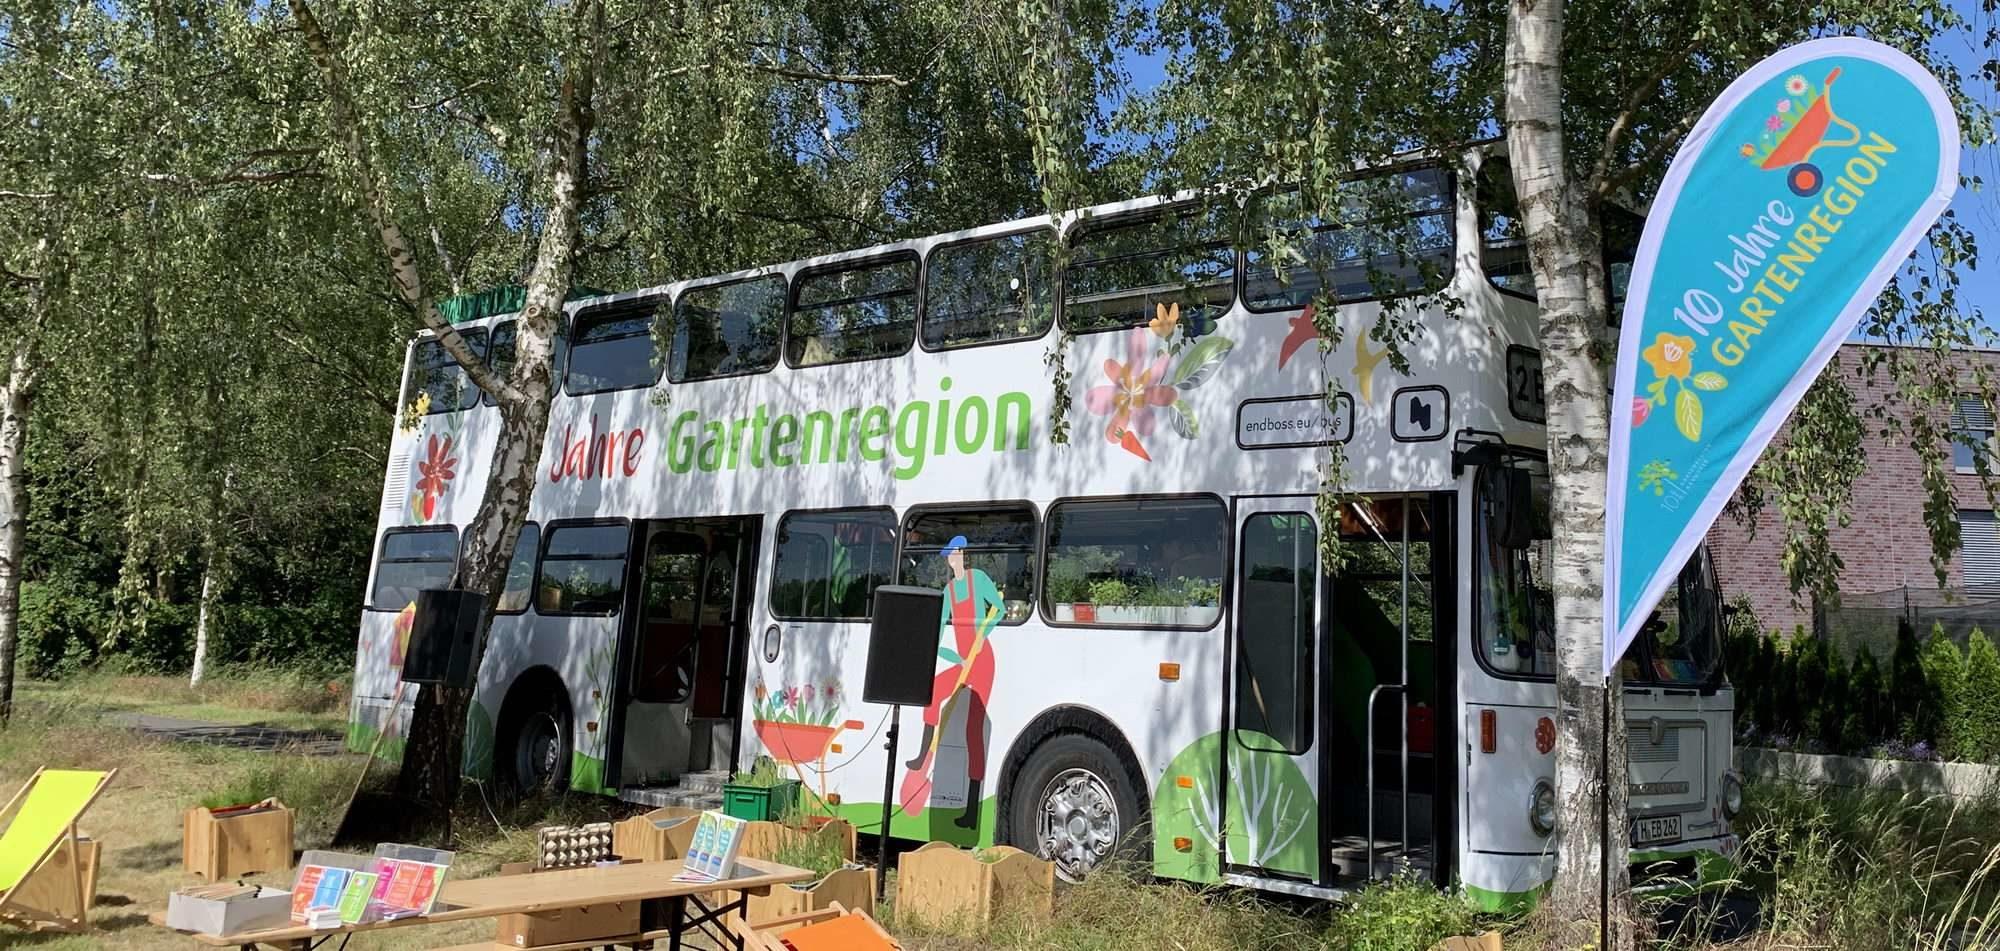 GartenSummen - Region Hannover